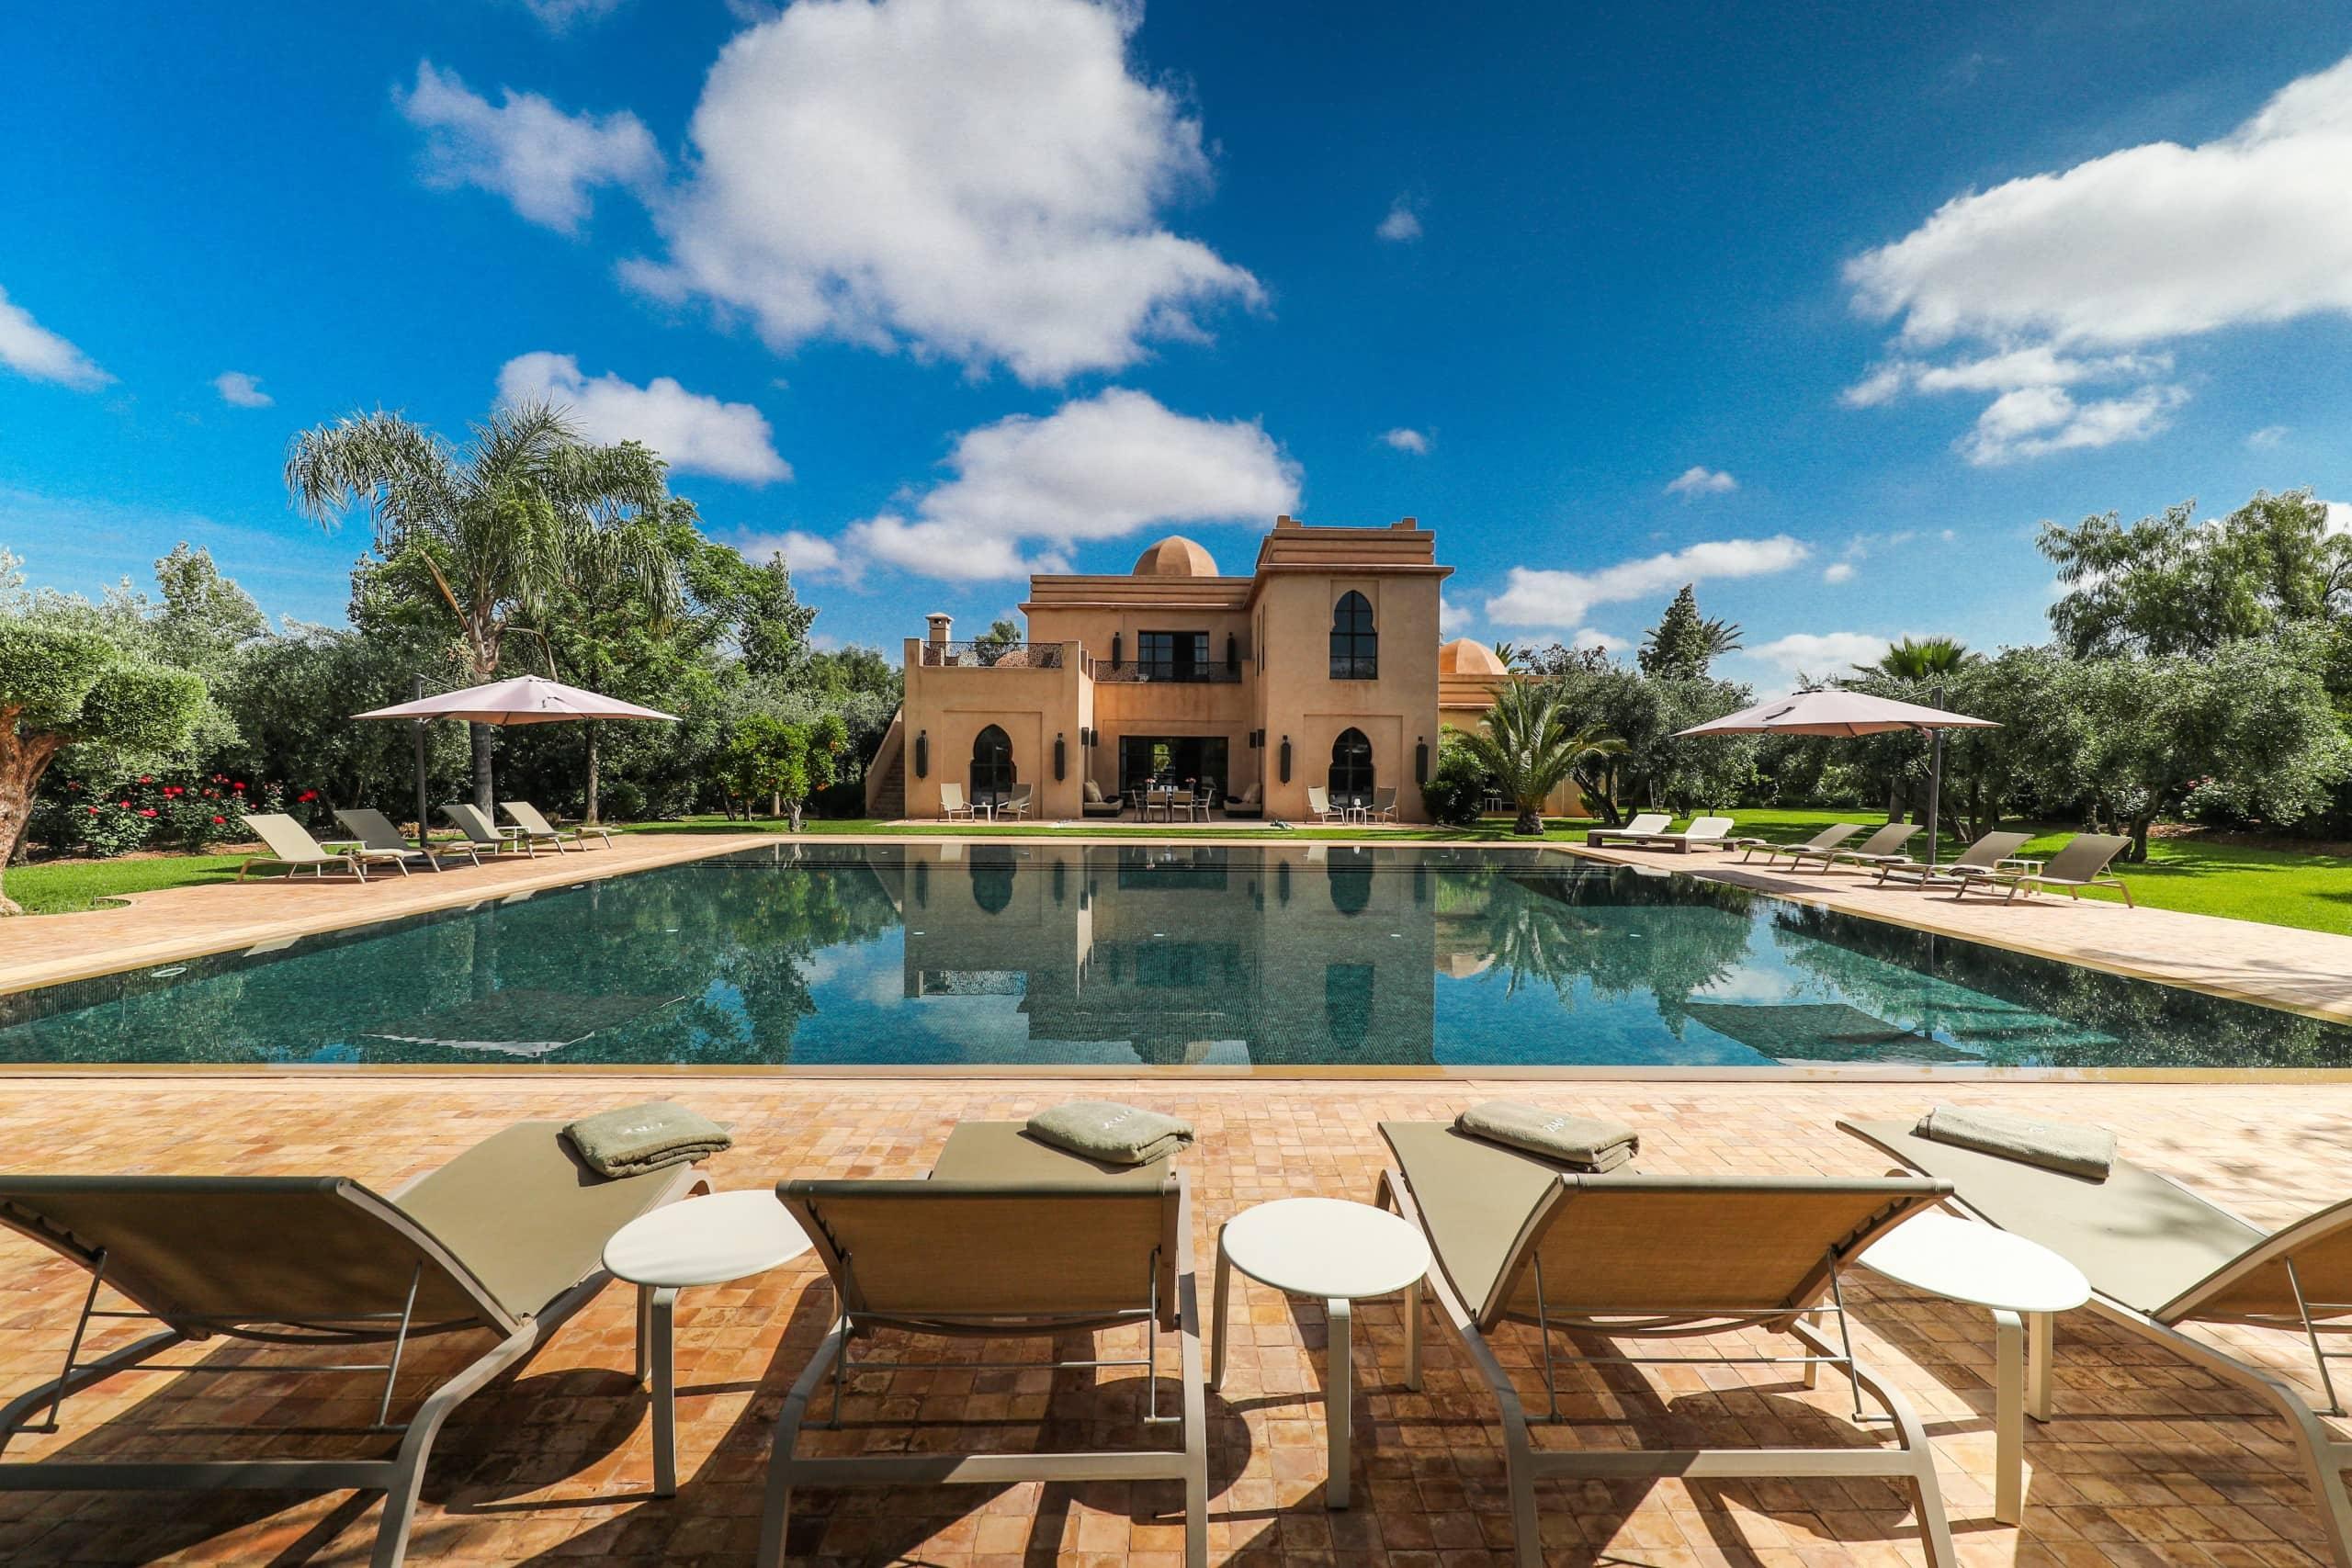 louer Villa Barth à Marrakech